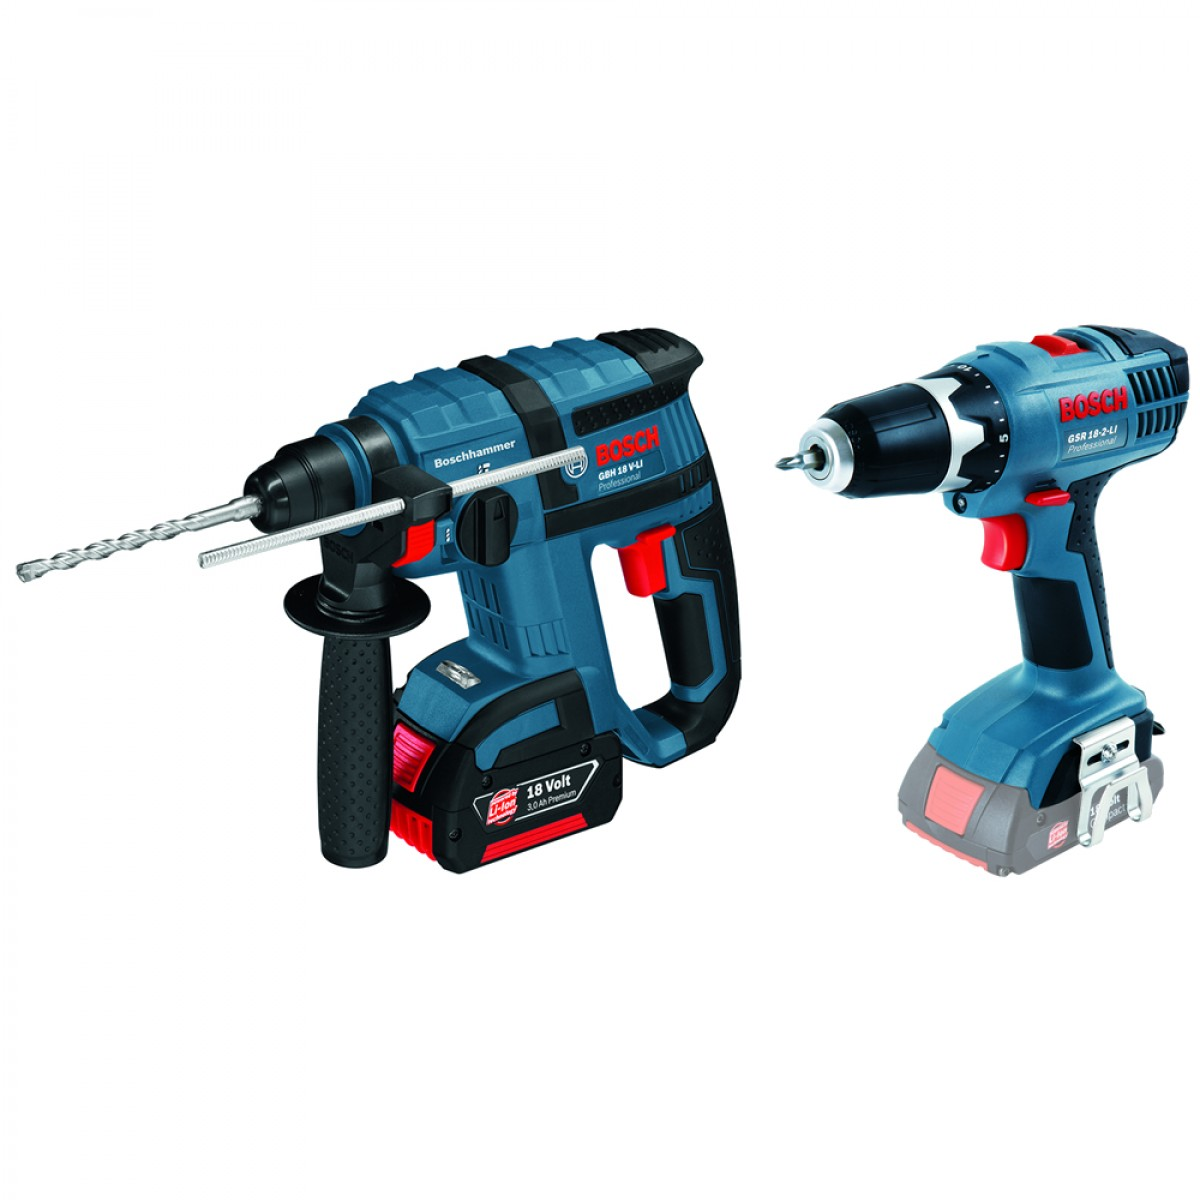 bosch li ion 18v combo kit set gbh18v li gsr18 2li cordless power tools products. Black Bedroom Furniture Sets. Home Design Ideas